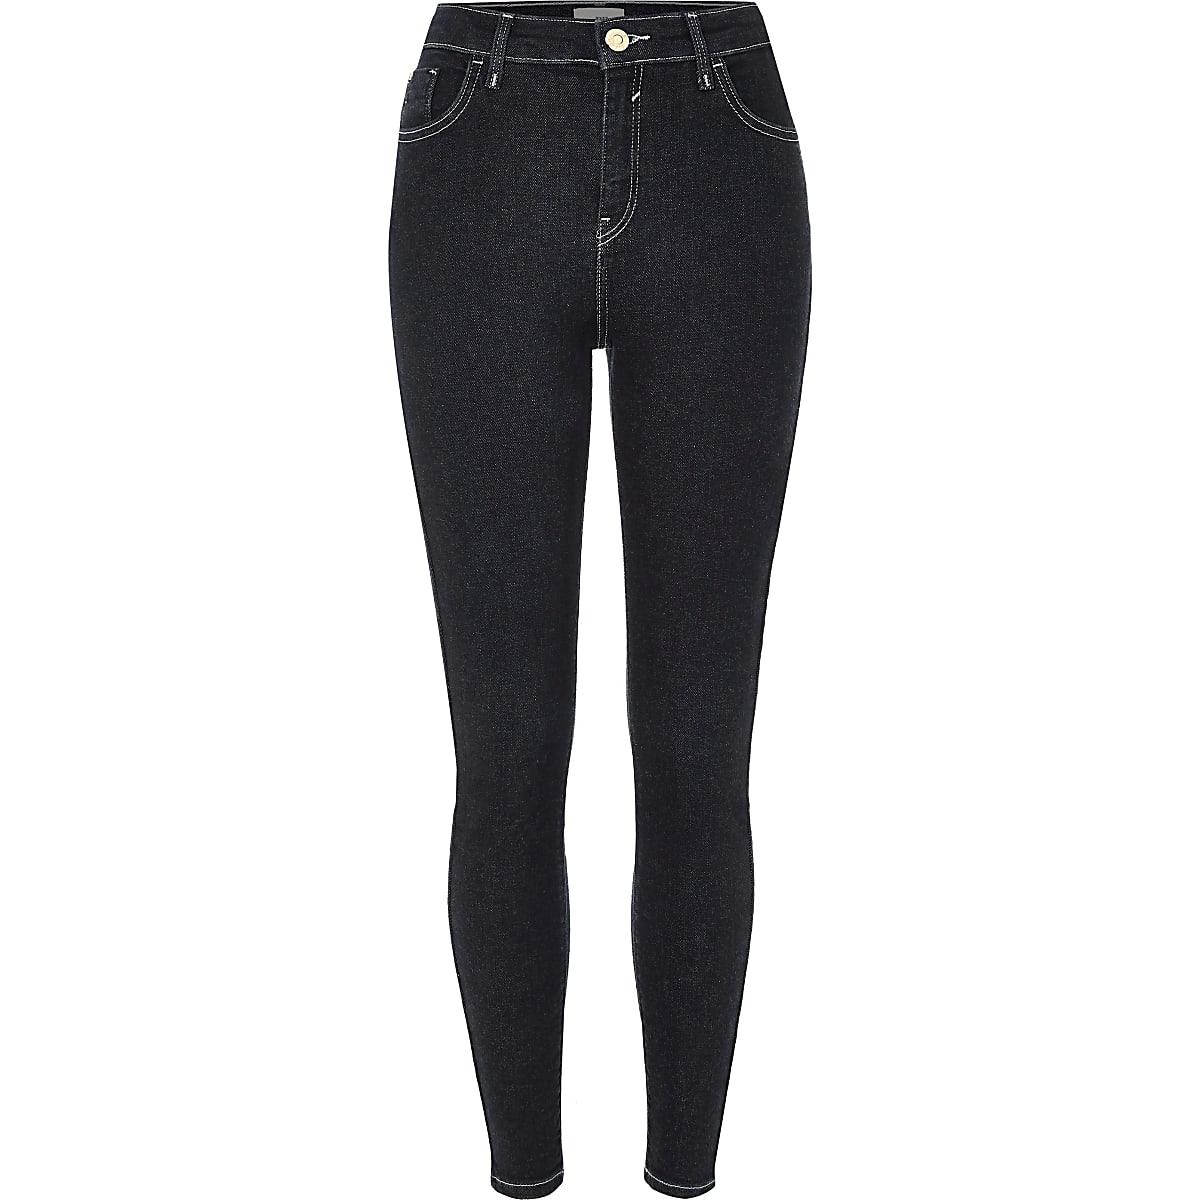 Dark denim Amelie skinny jeans